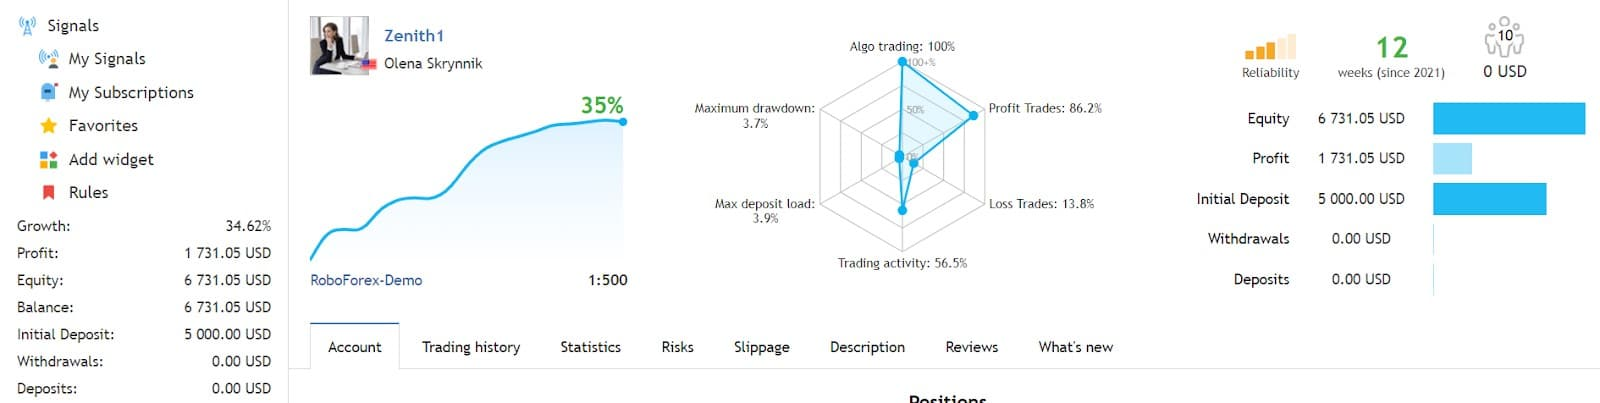 Trading Performance of Zenith EA